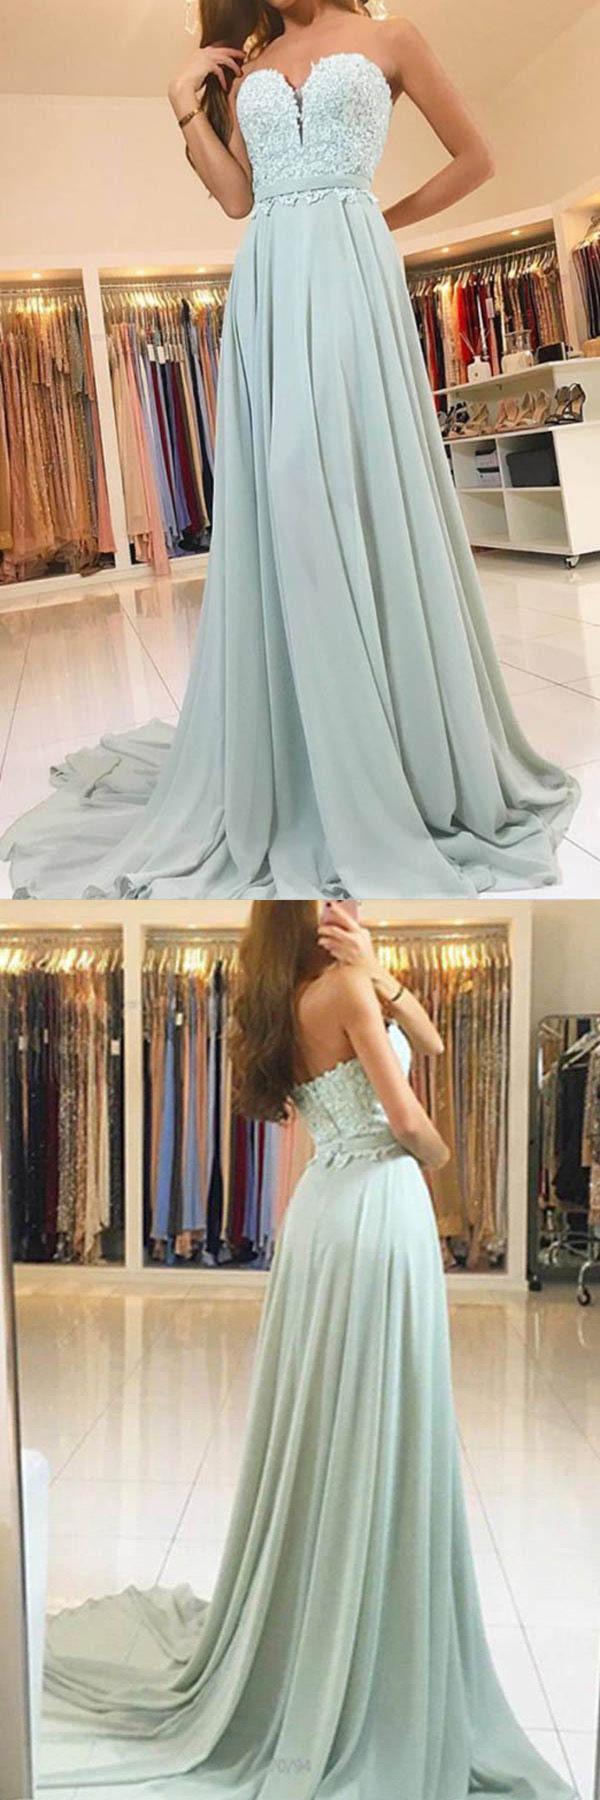 Elegant sweetheart lace evening dress long chiffon prom dress pg